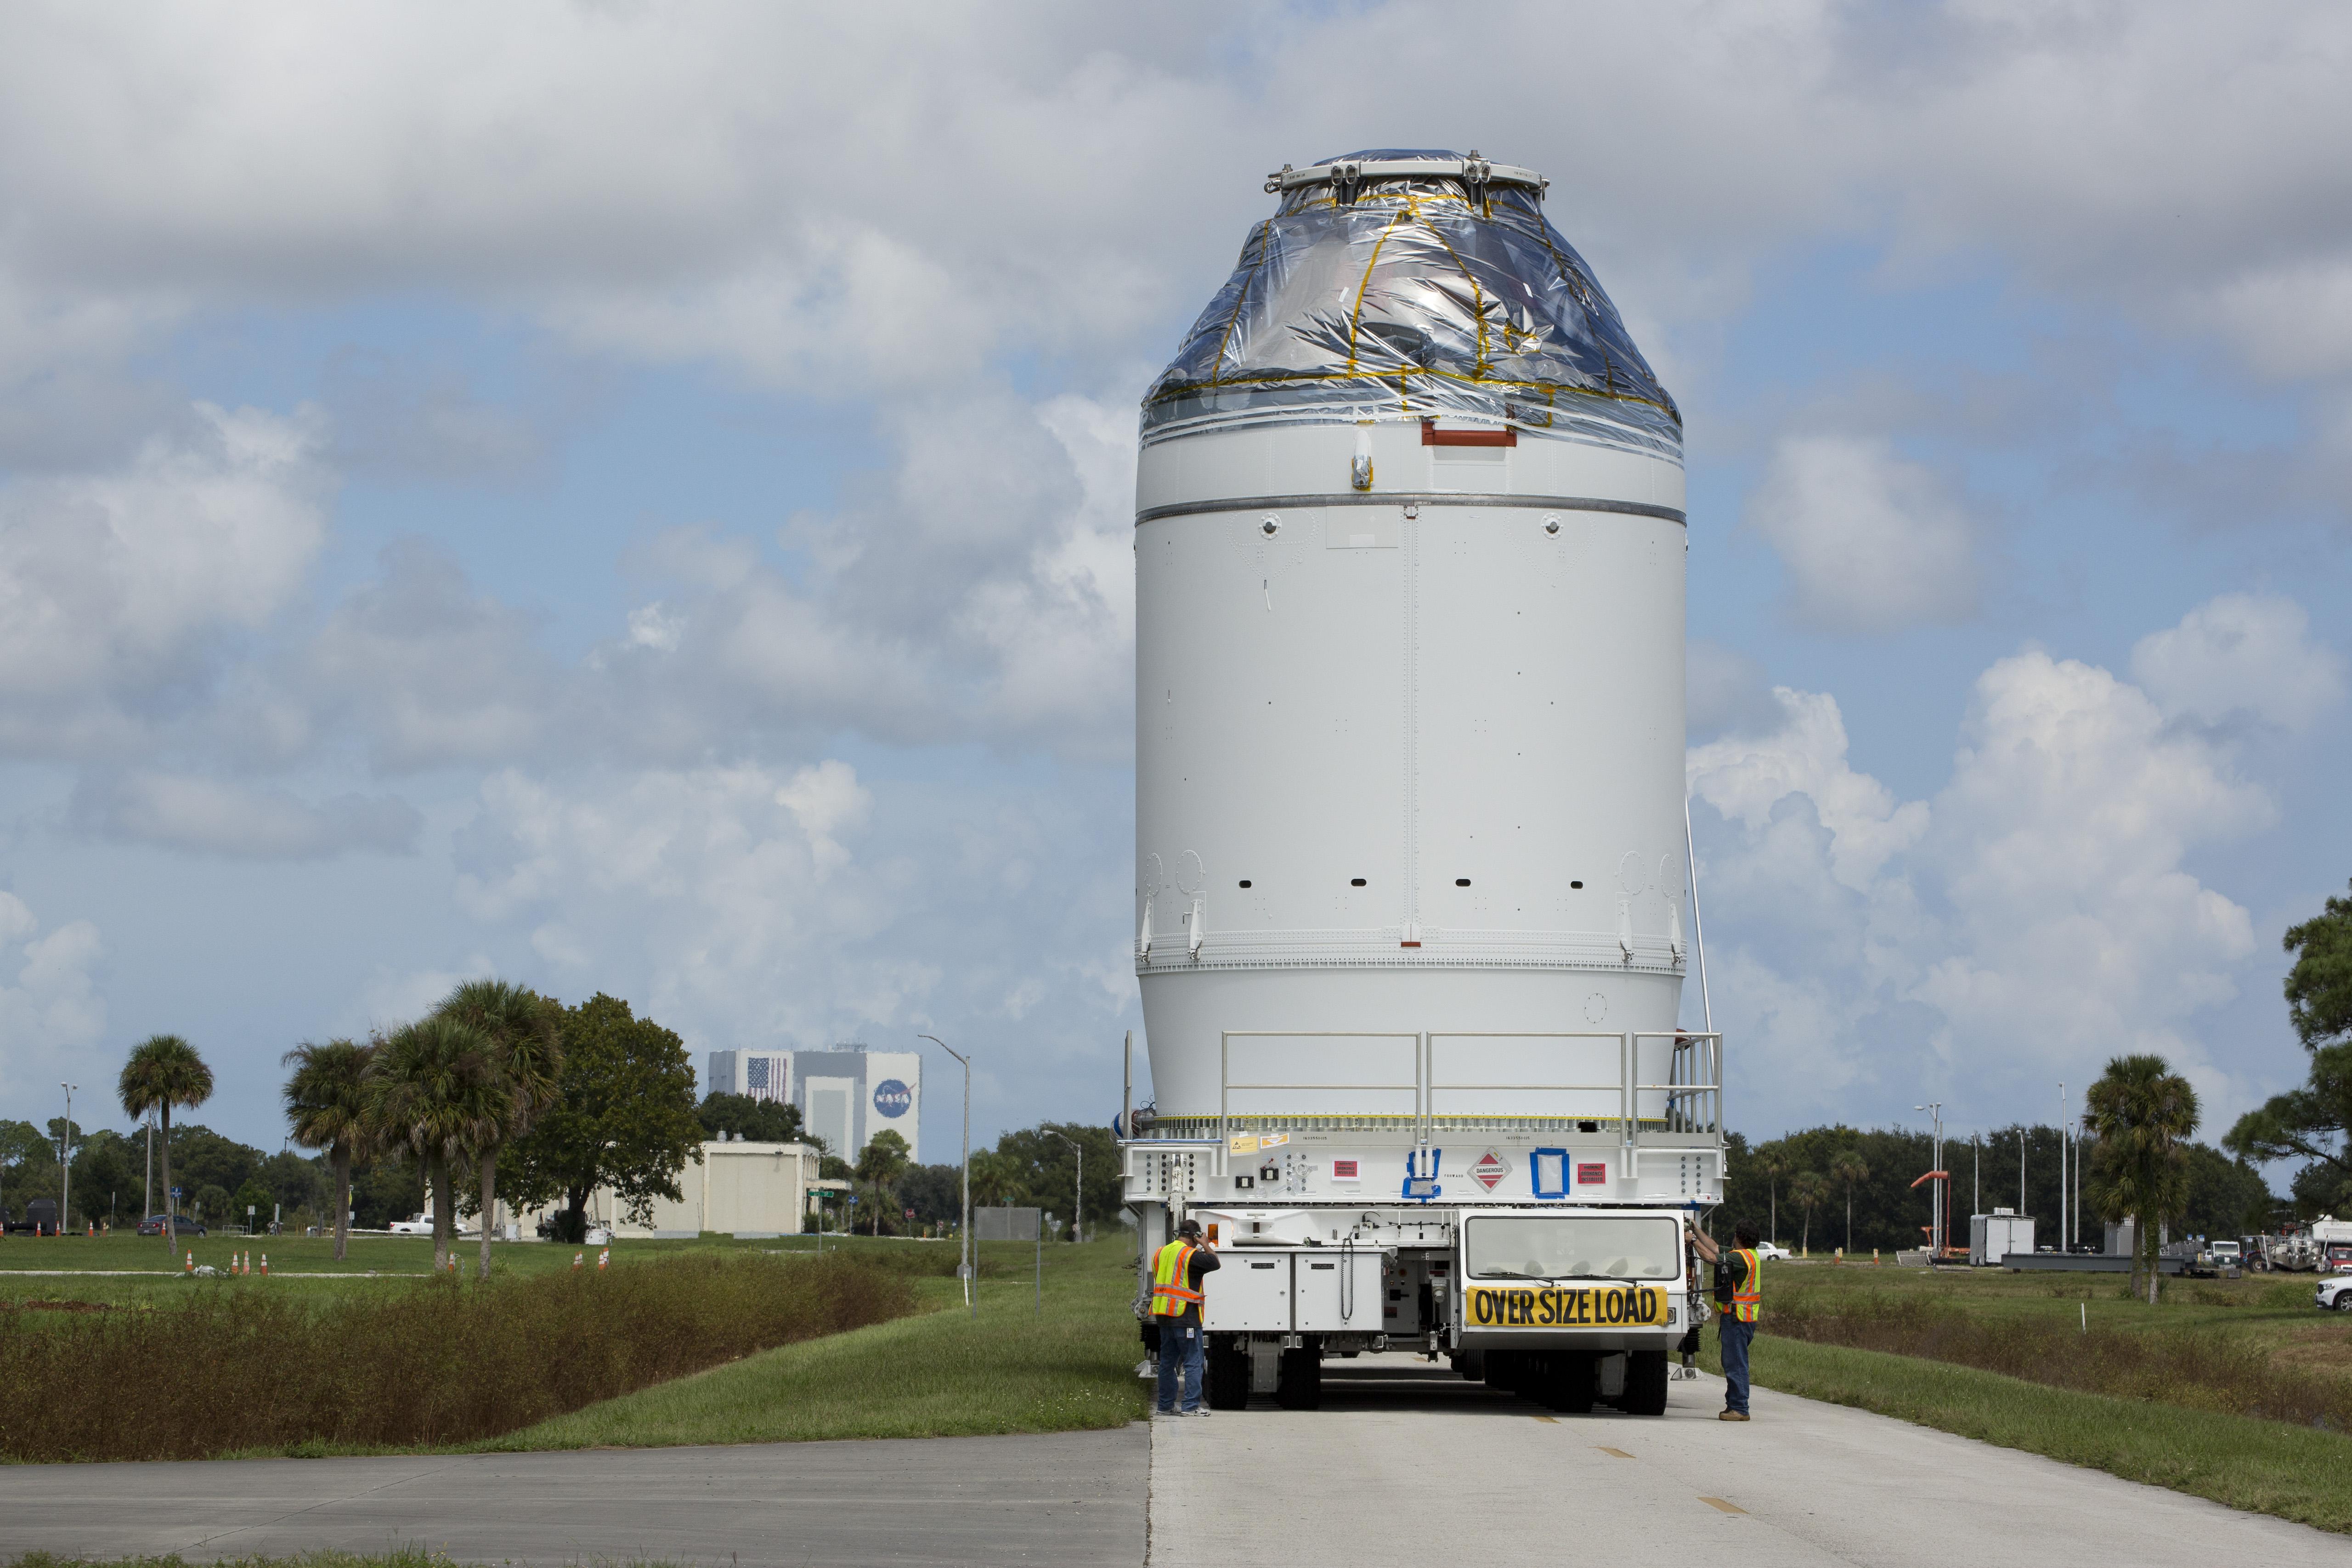 spacecraft grounding - photo #35